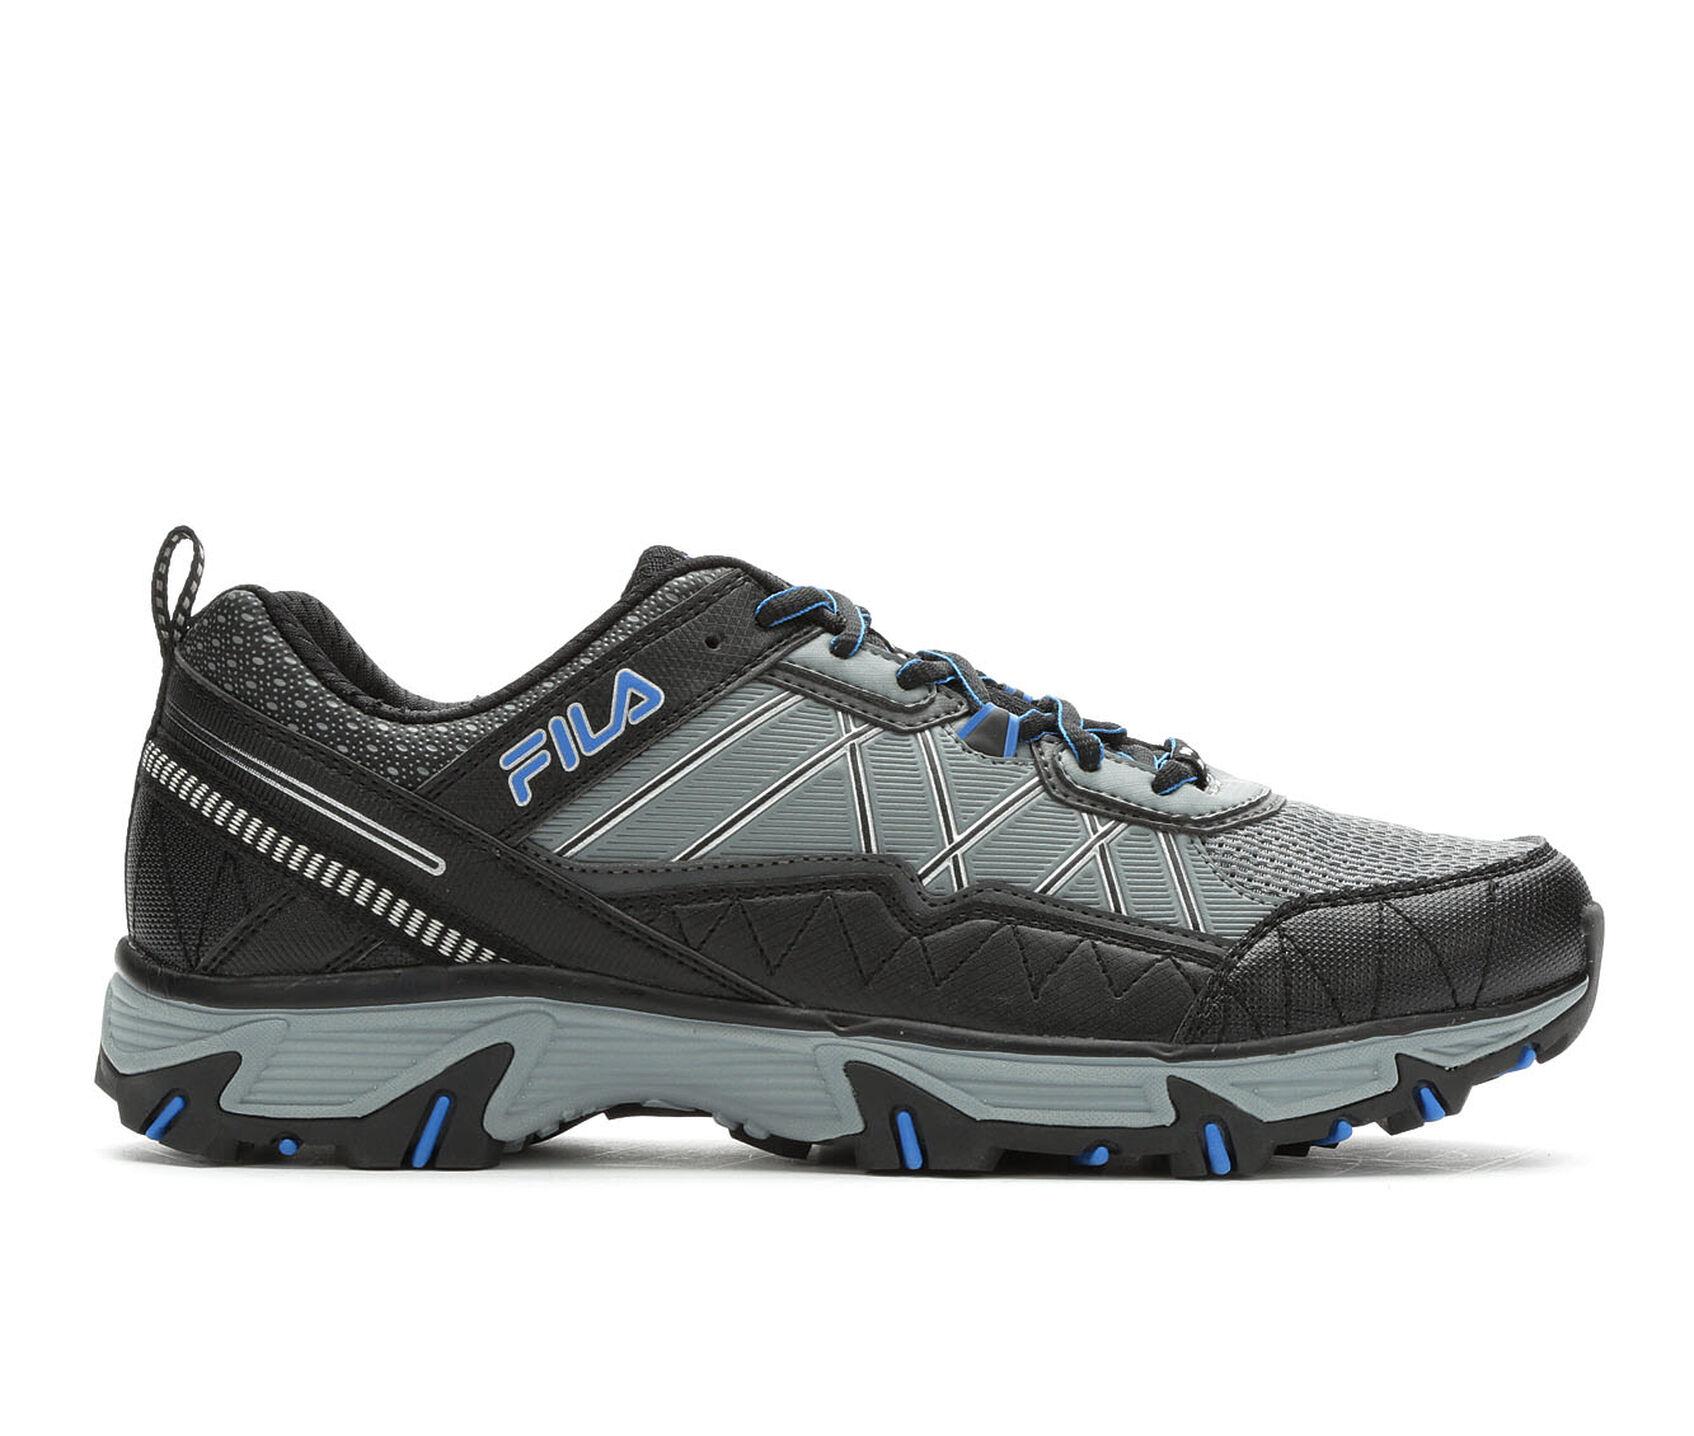 12f037150b Men s Fila At Peake 20 Trail Running Shoes